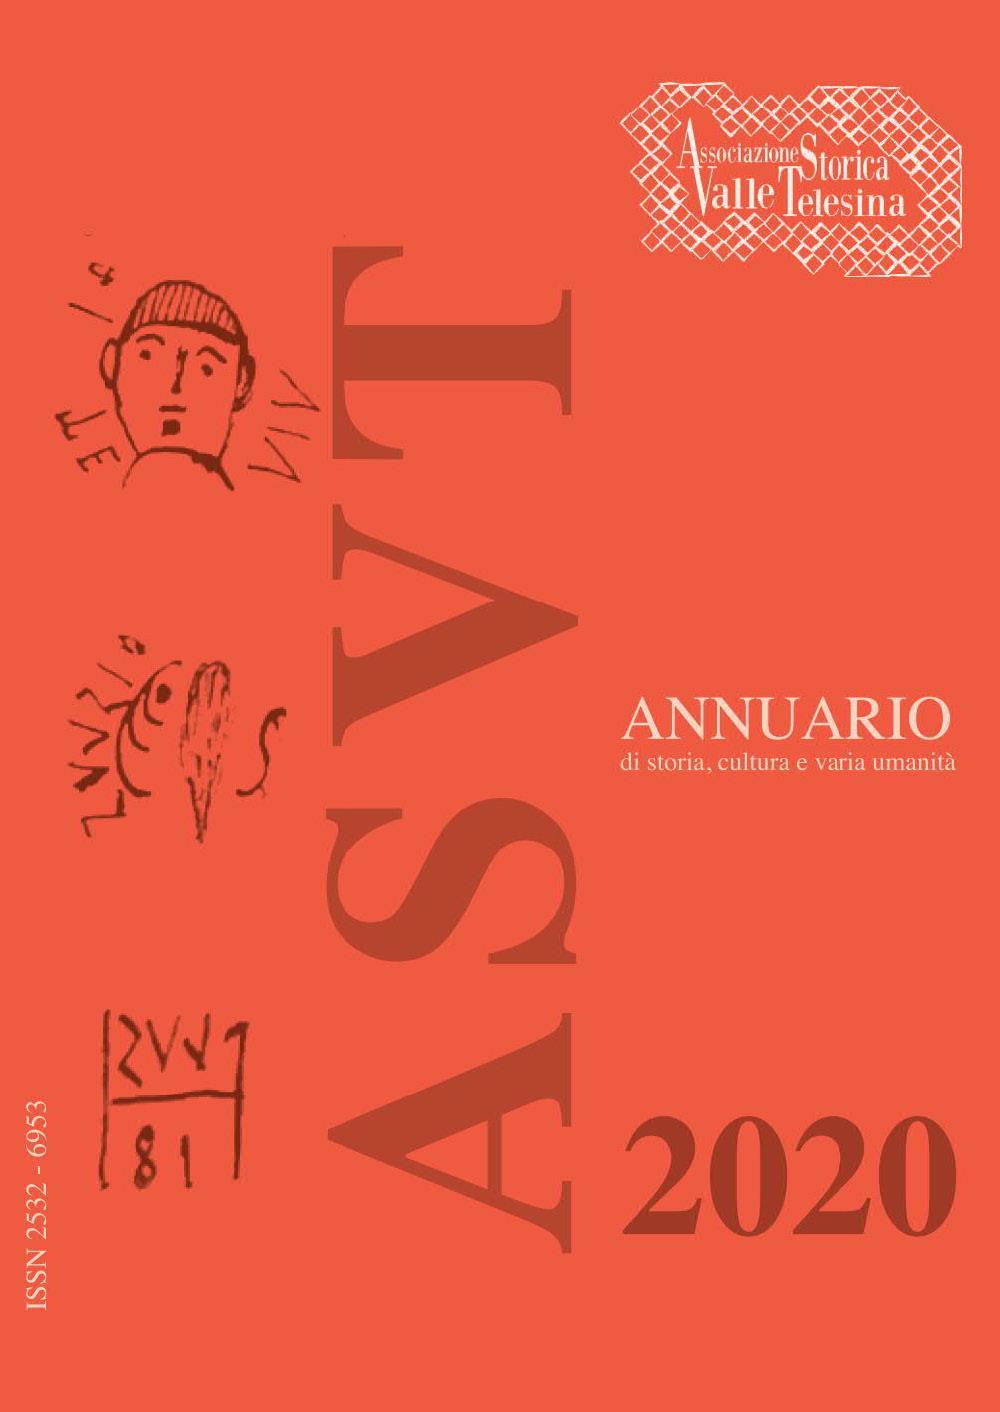 Annuario di storia cultura e varia umanità